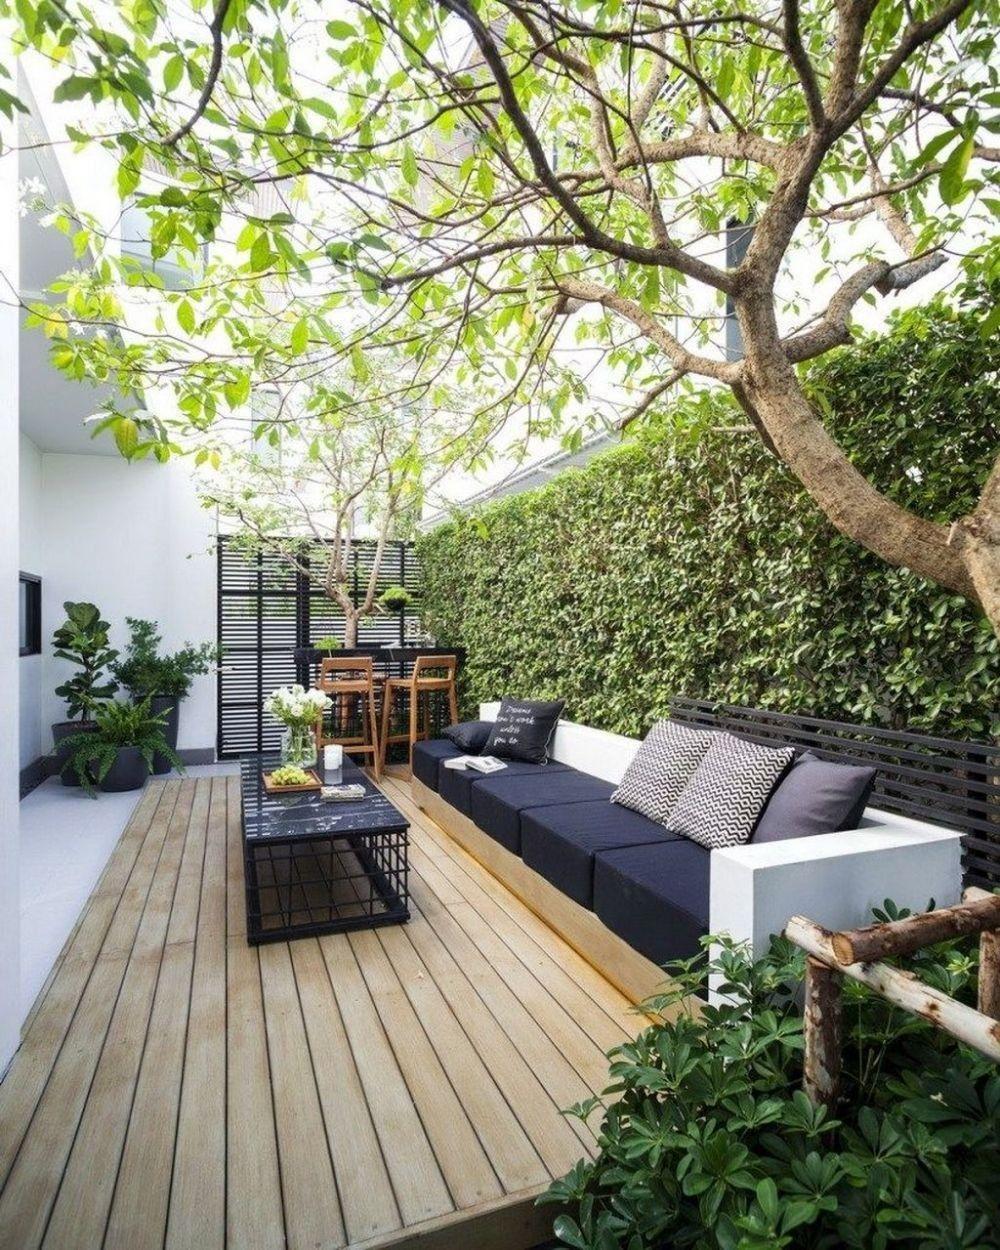 10 Tips Gaya Penataan Taman Rumah Mulai Ala Jepang Sampai Modern Desain Patio Dekorasi Luar Ruangan Tanaman Dalam Rumah